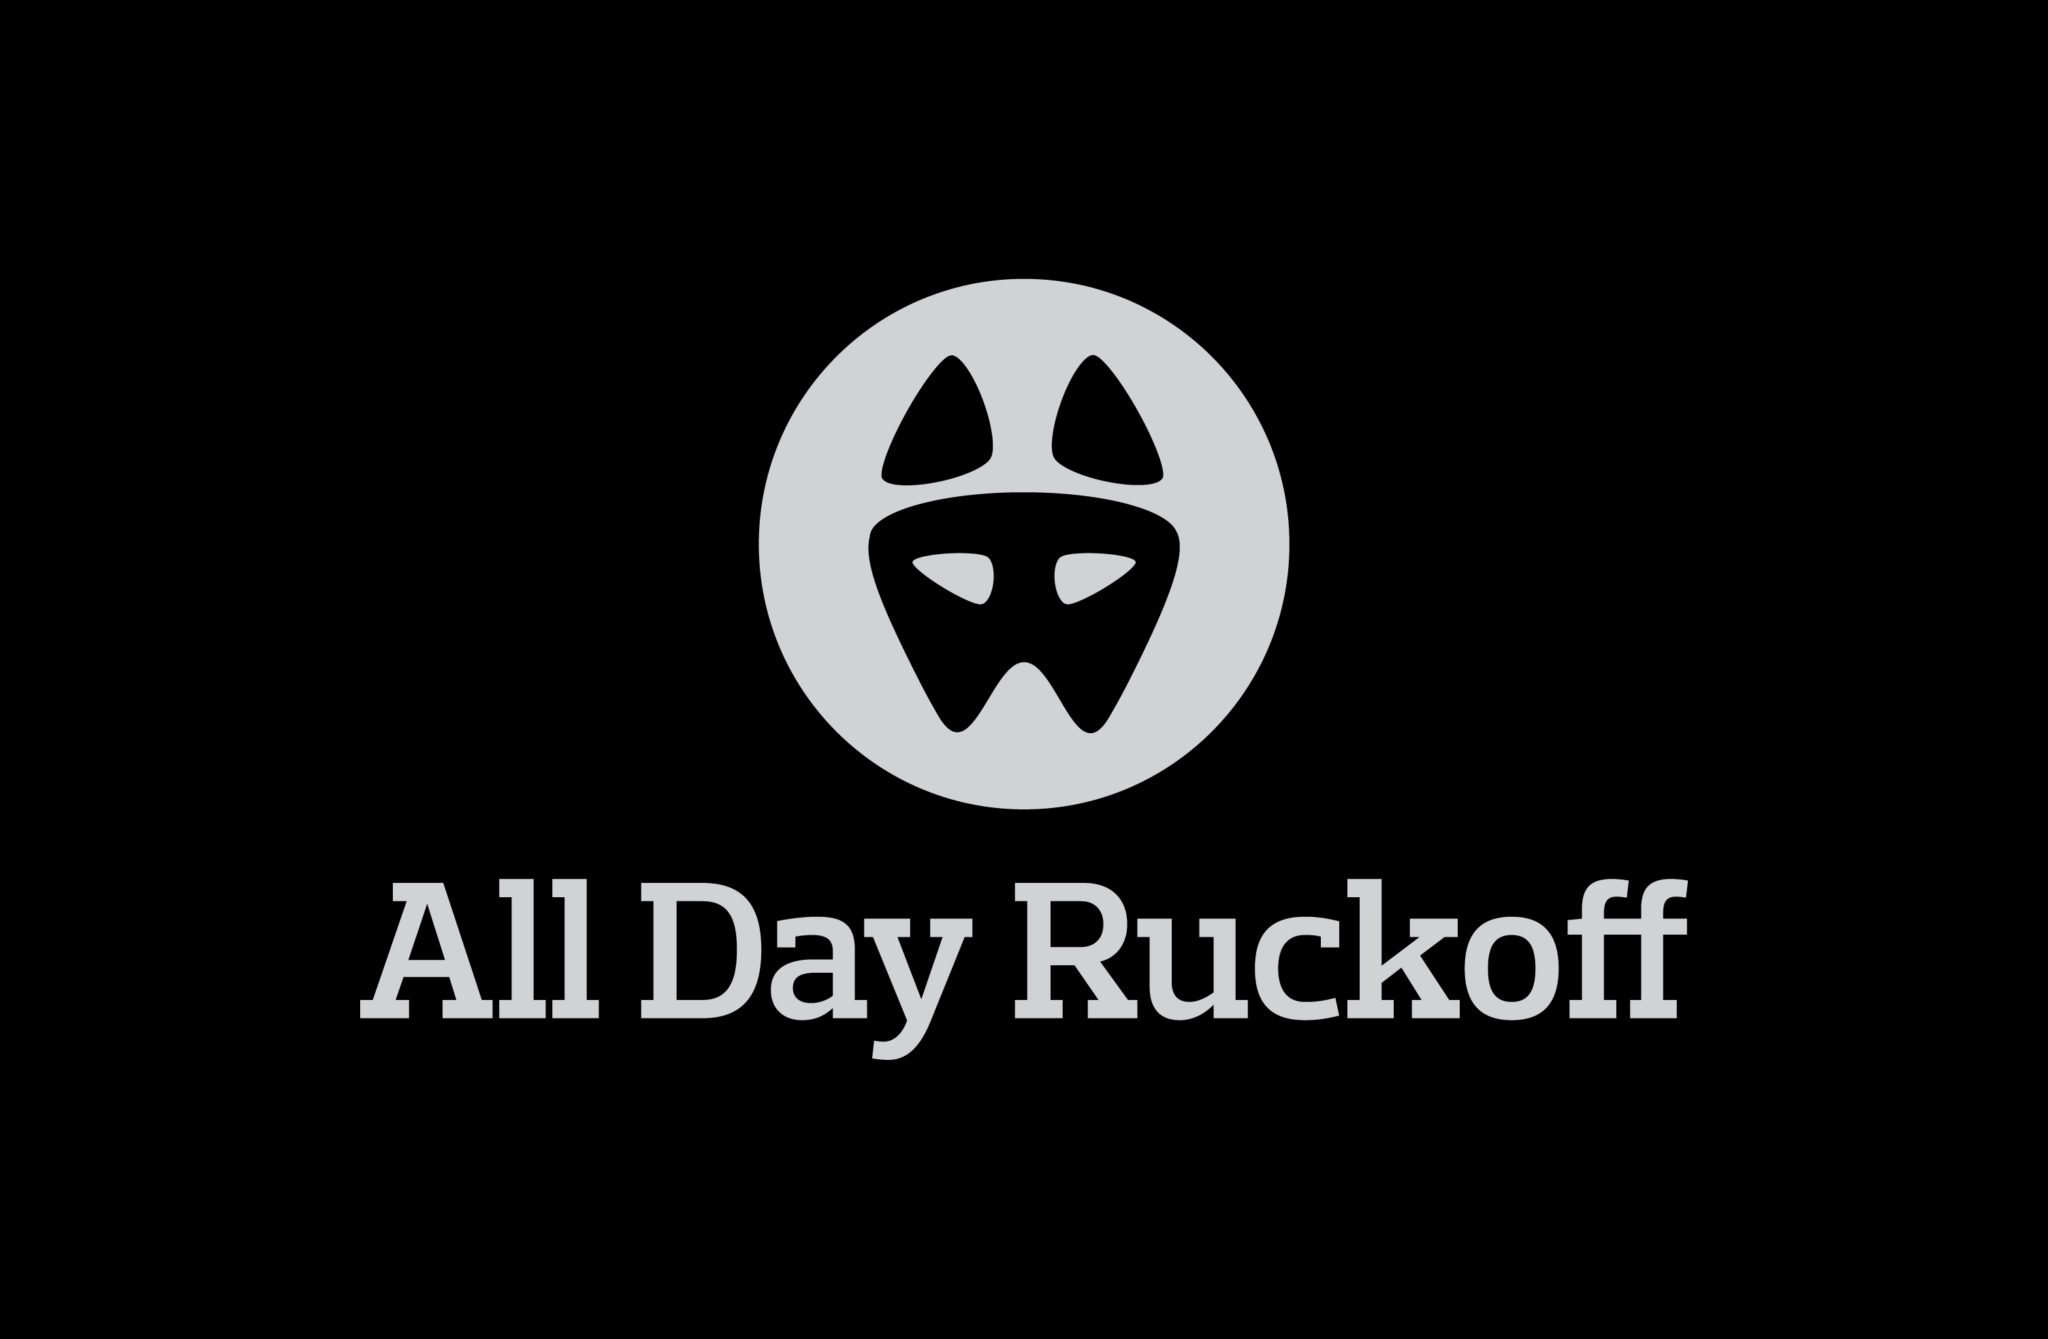 All Day Ruckoff hi resolution bitmap-02